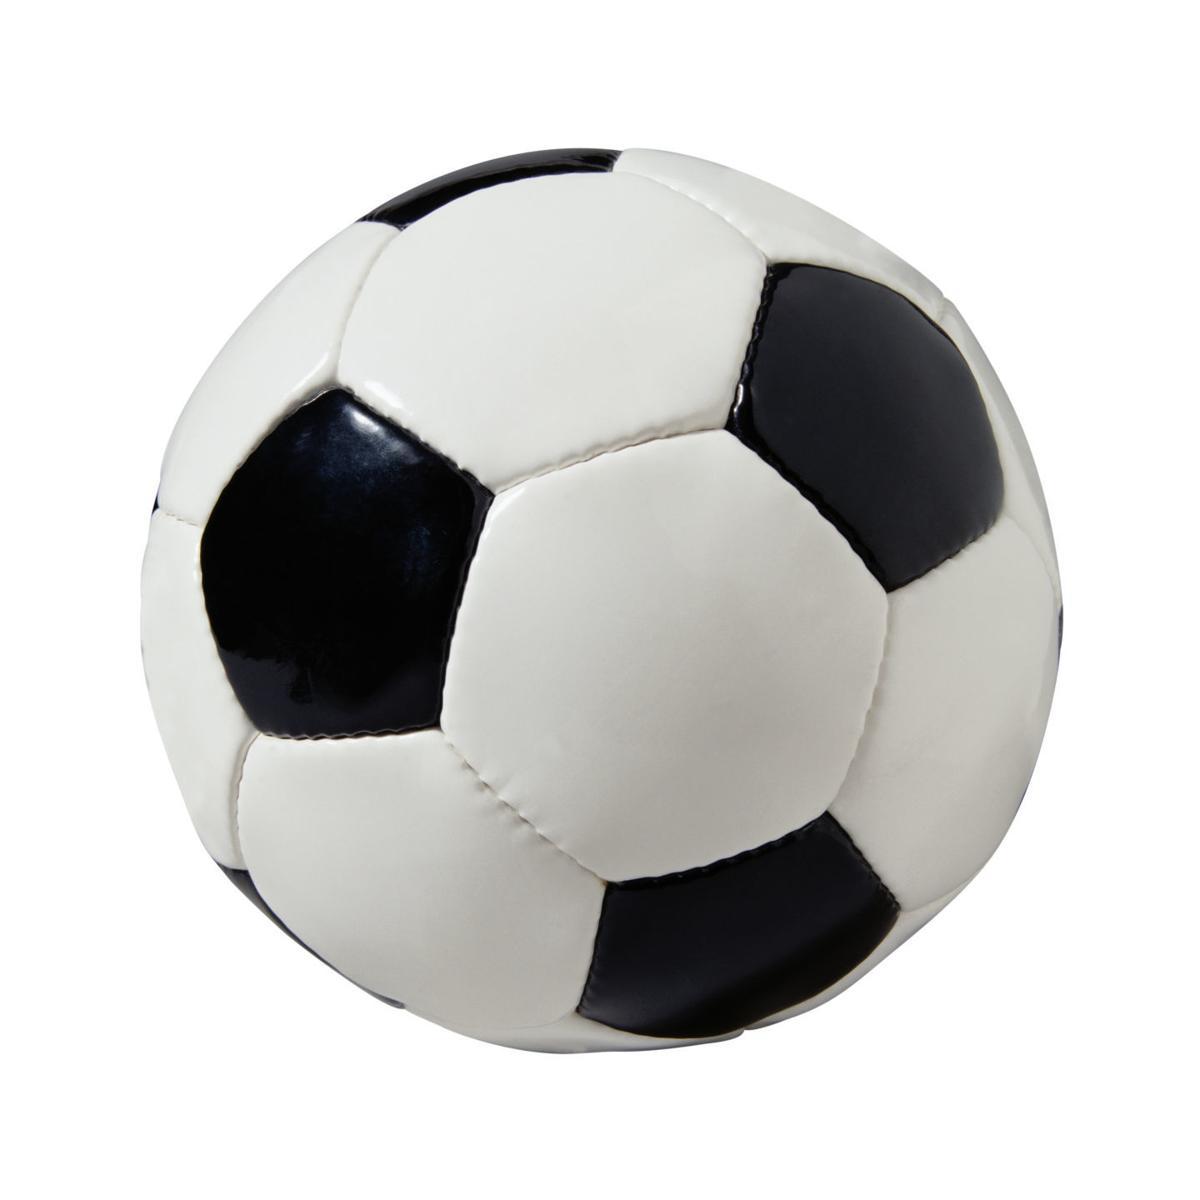 052617-blm-lif-soccerball